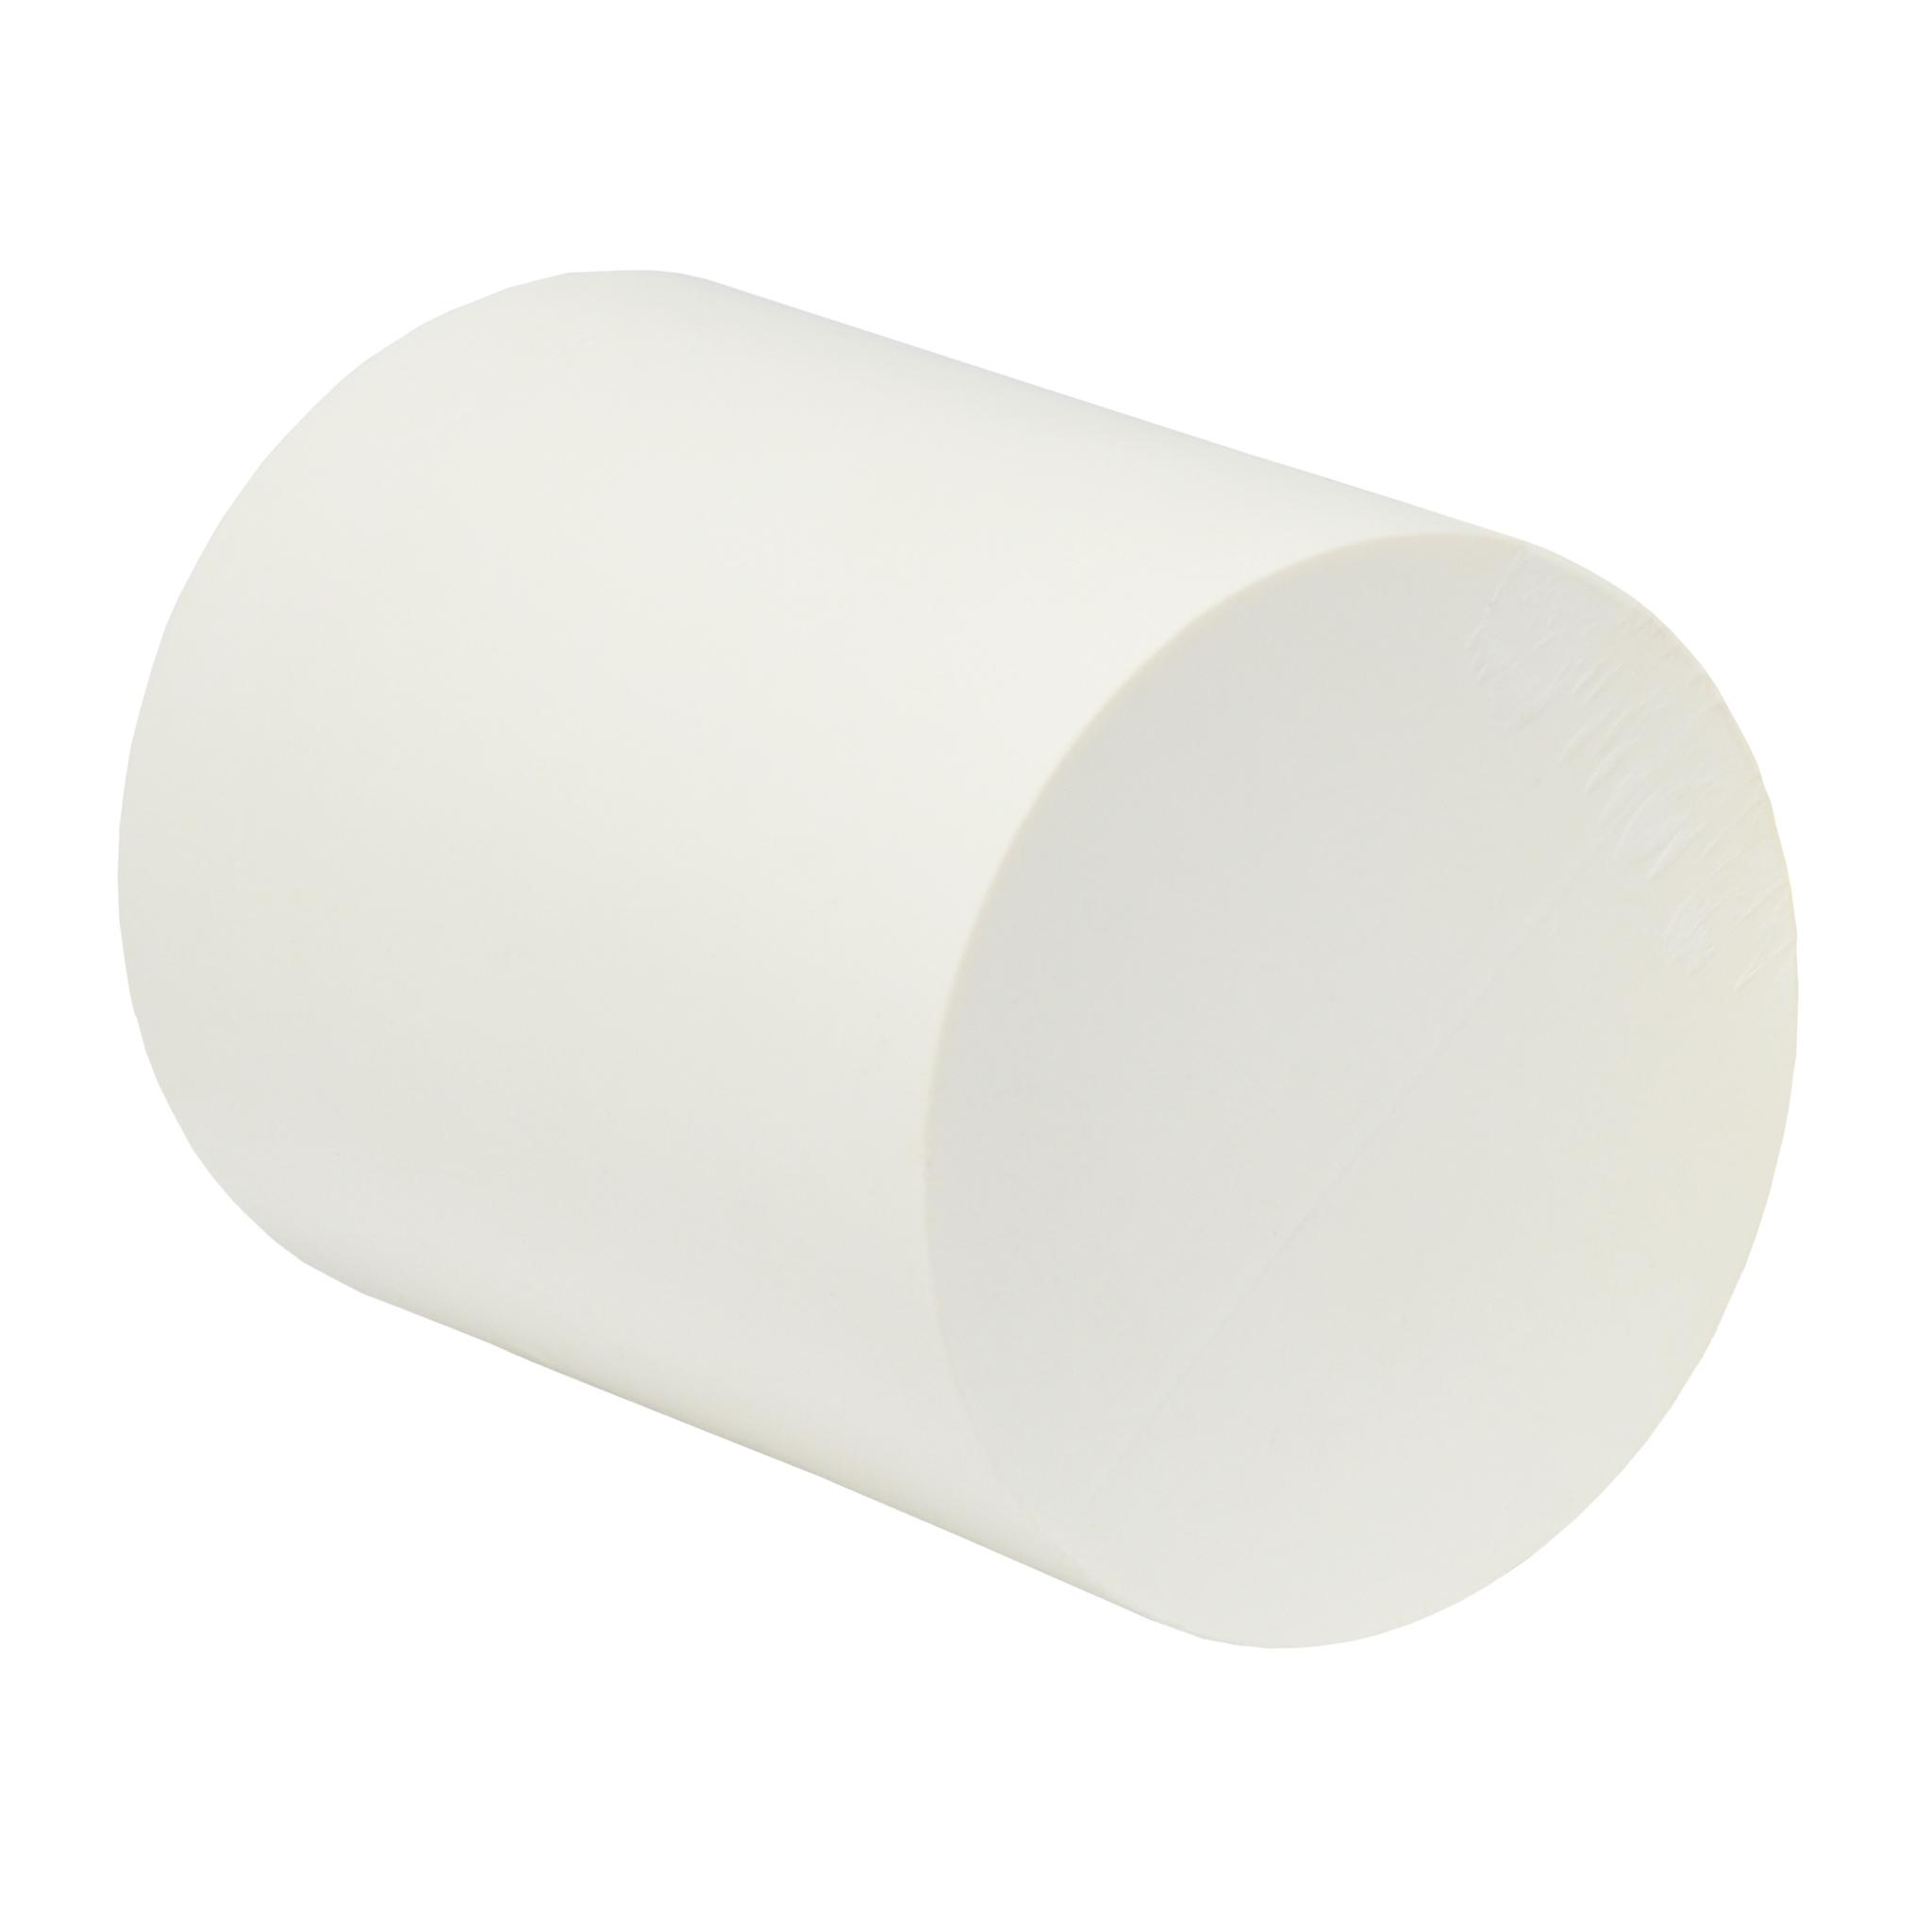 HRANITHERM 600.71 White - EVA Hot Melt Cartridge